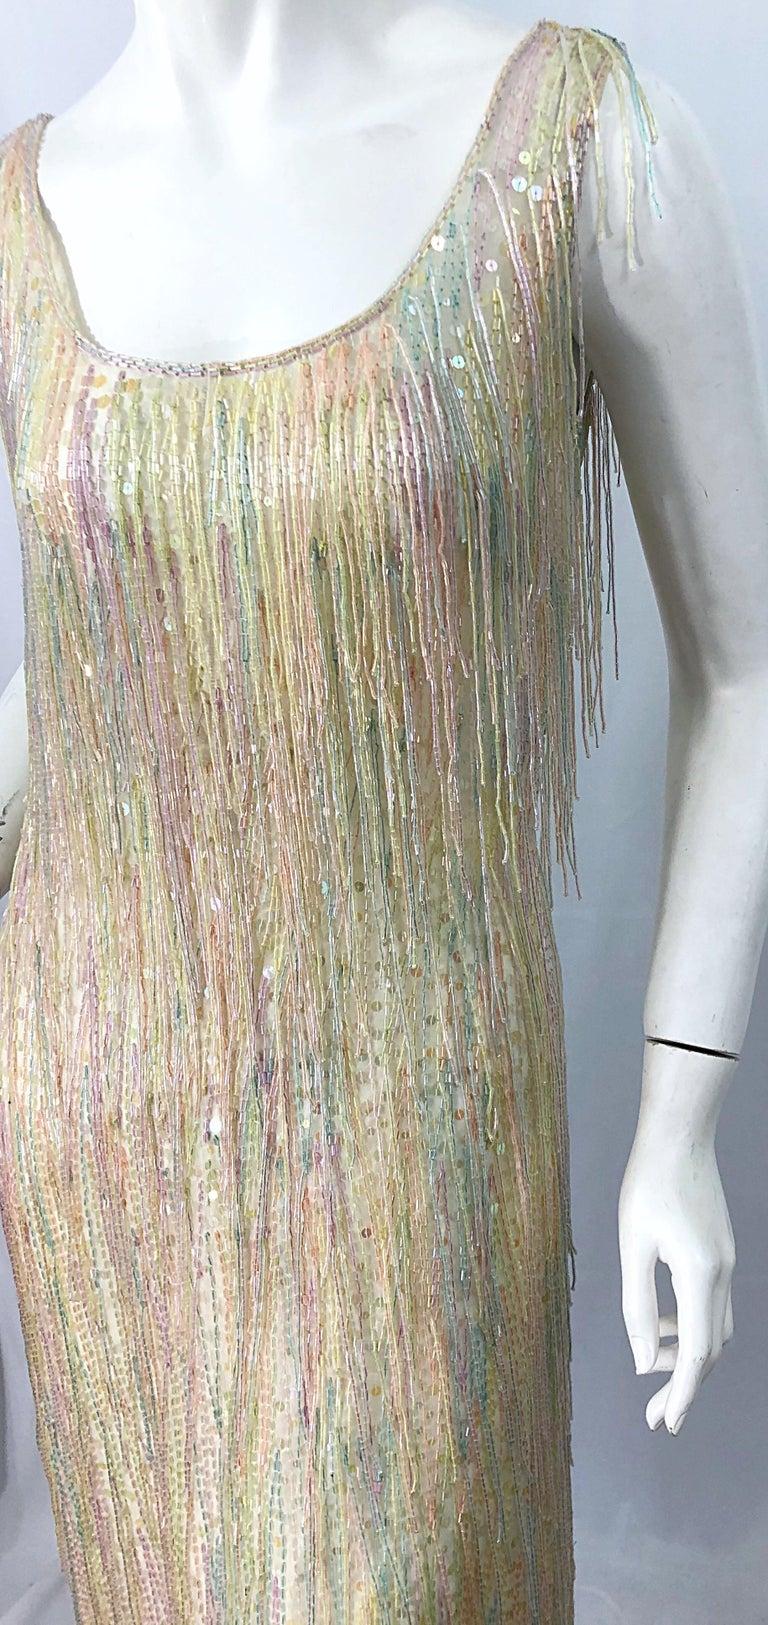 Halston MET Musuem 1970s Fully Fringed Beaded Flapper Style Vintage 70s Dress For Sale 2